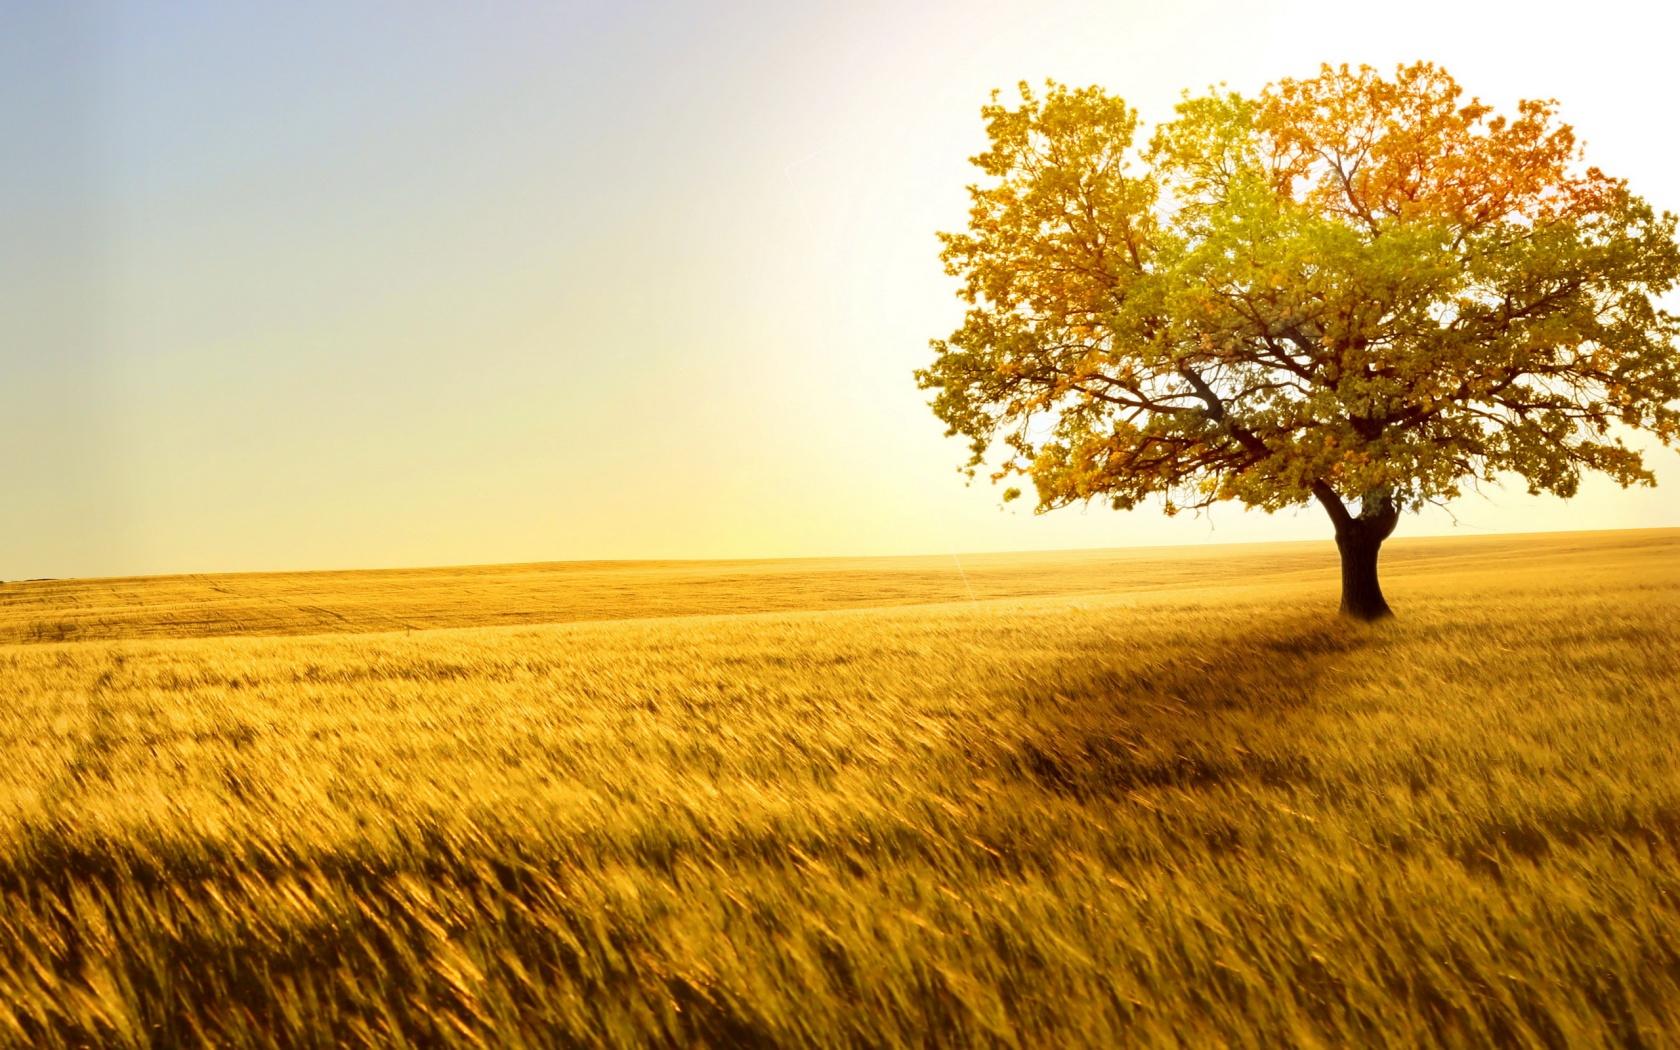 Beautiful nature 1680 x 1050 download close